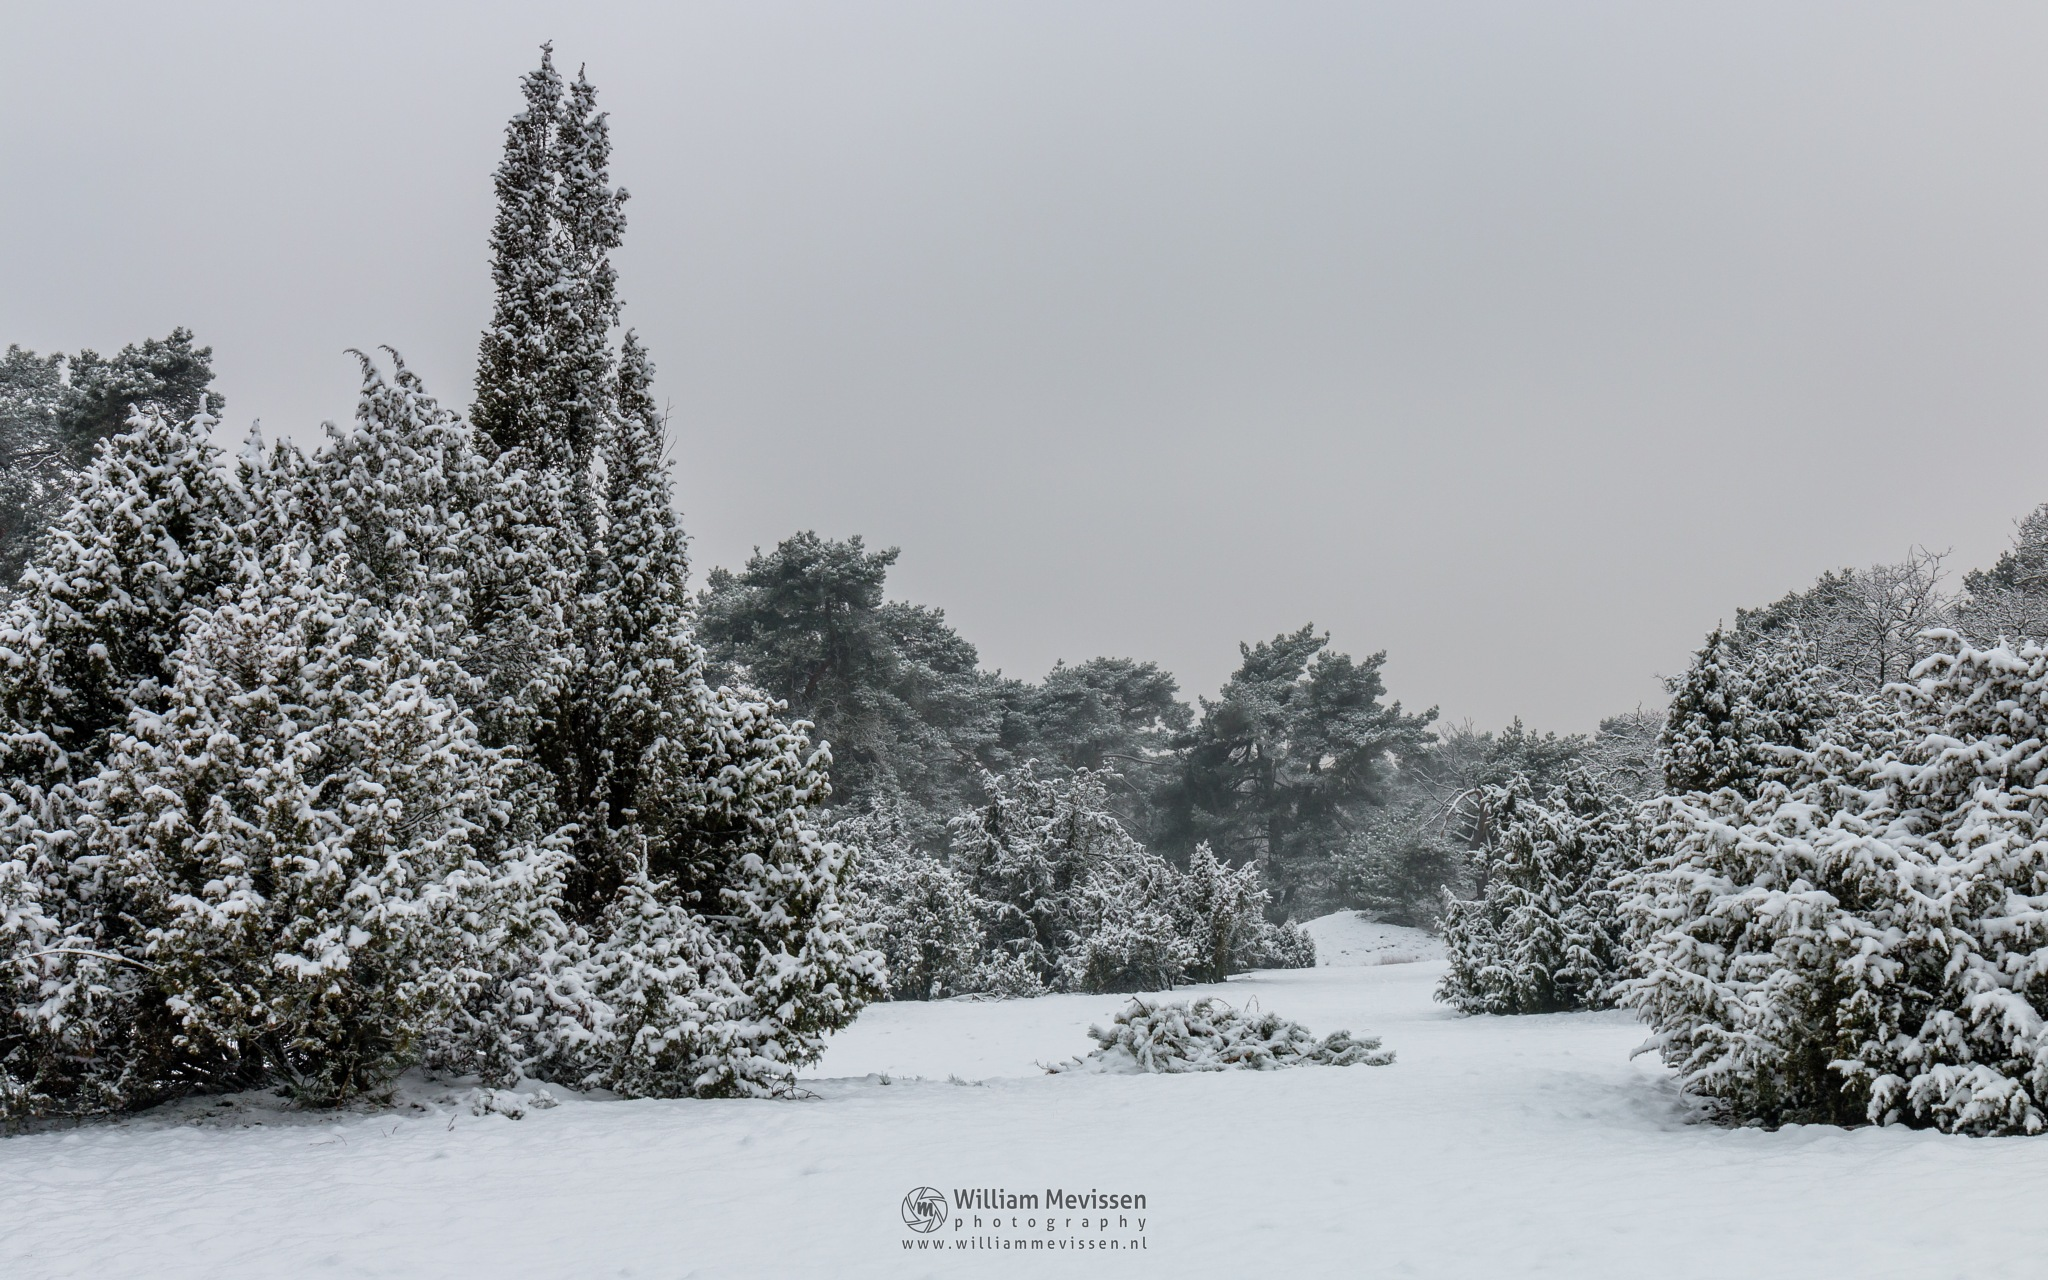 White Winter Morning by William Mevissen